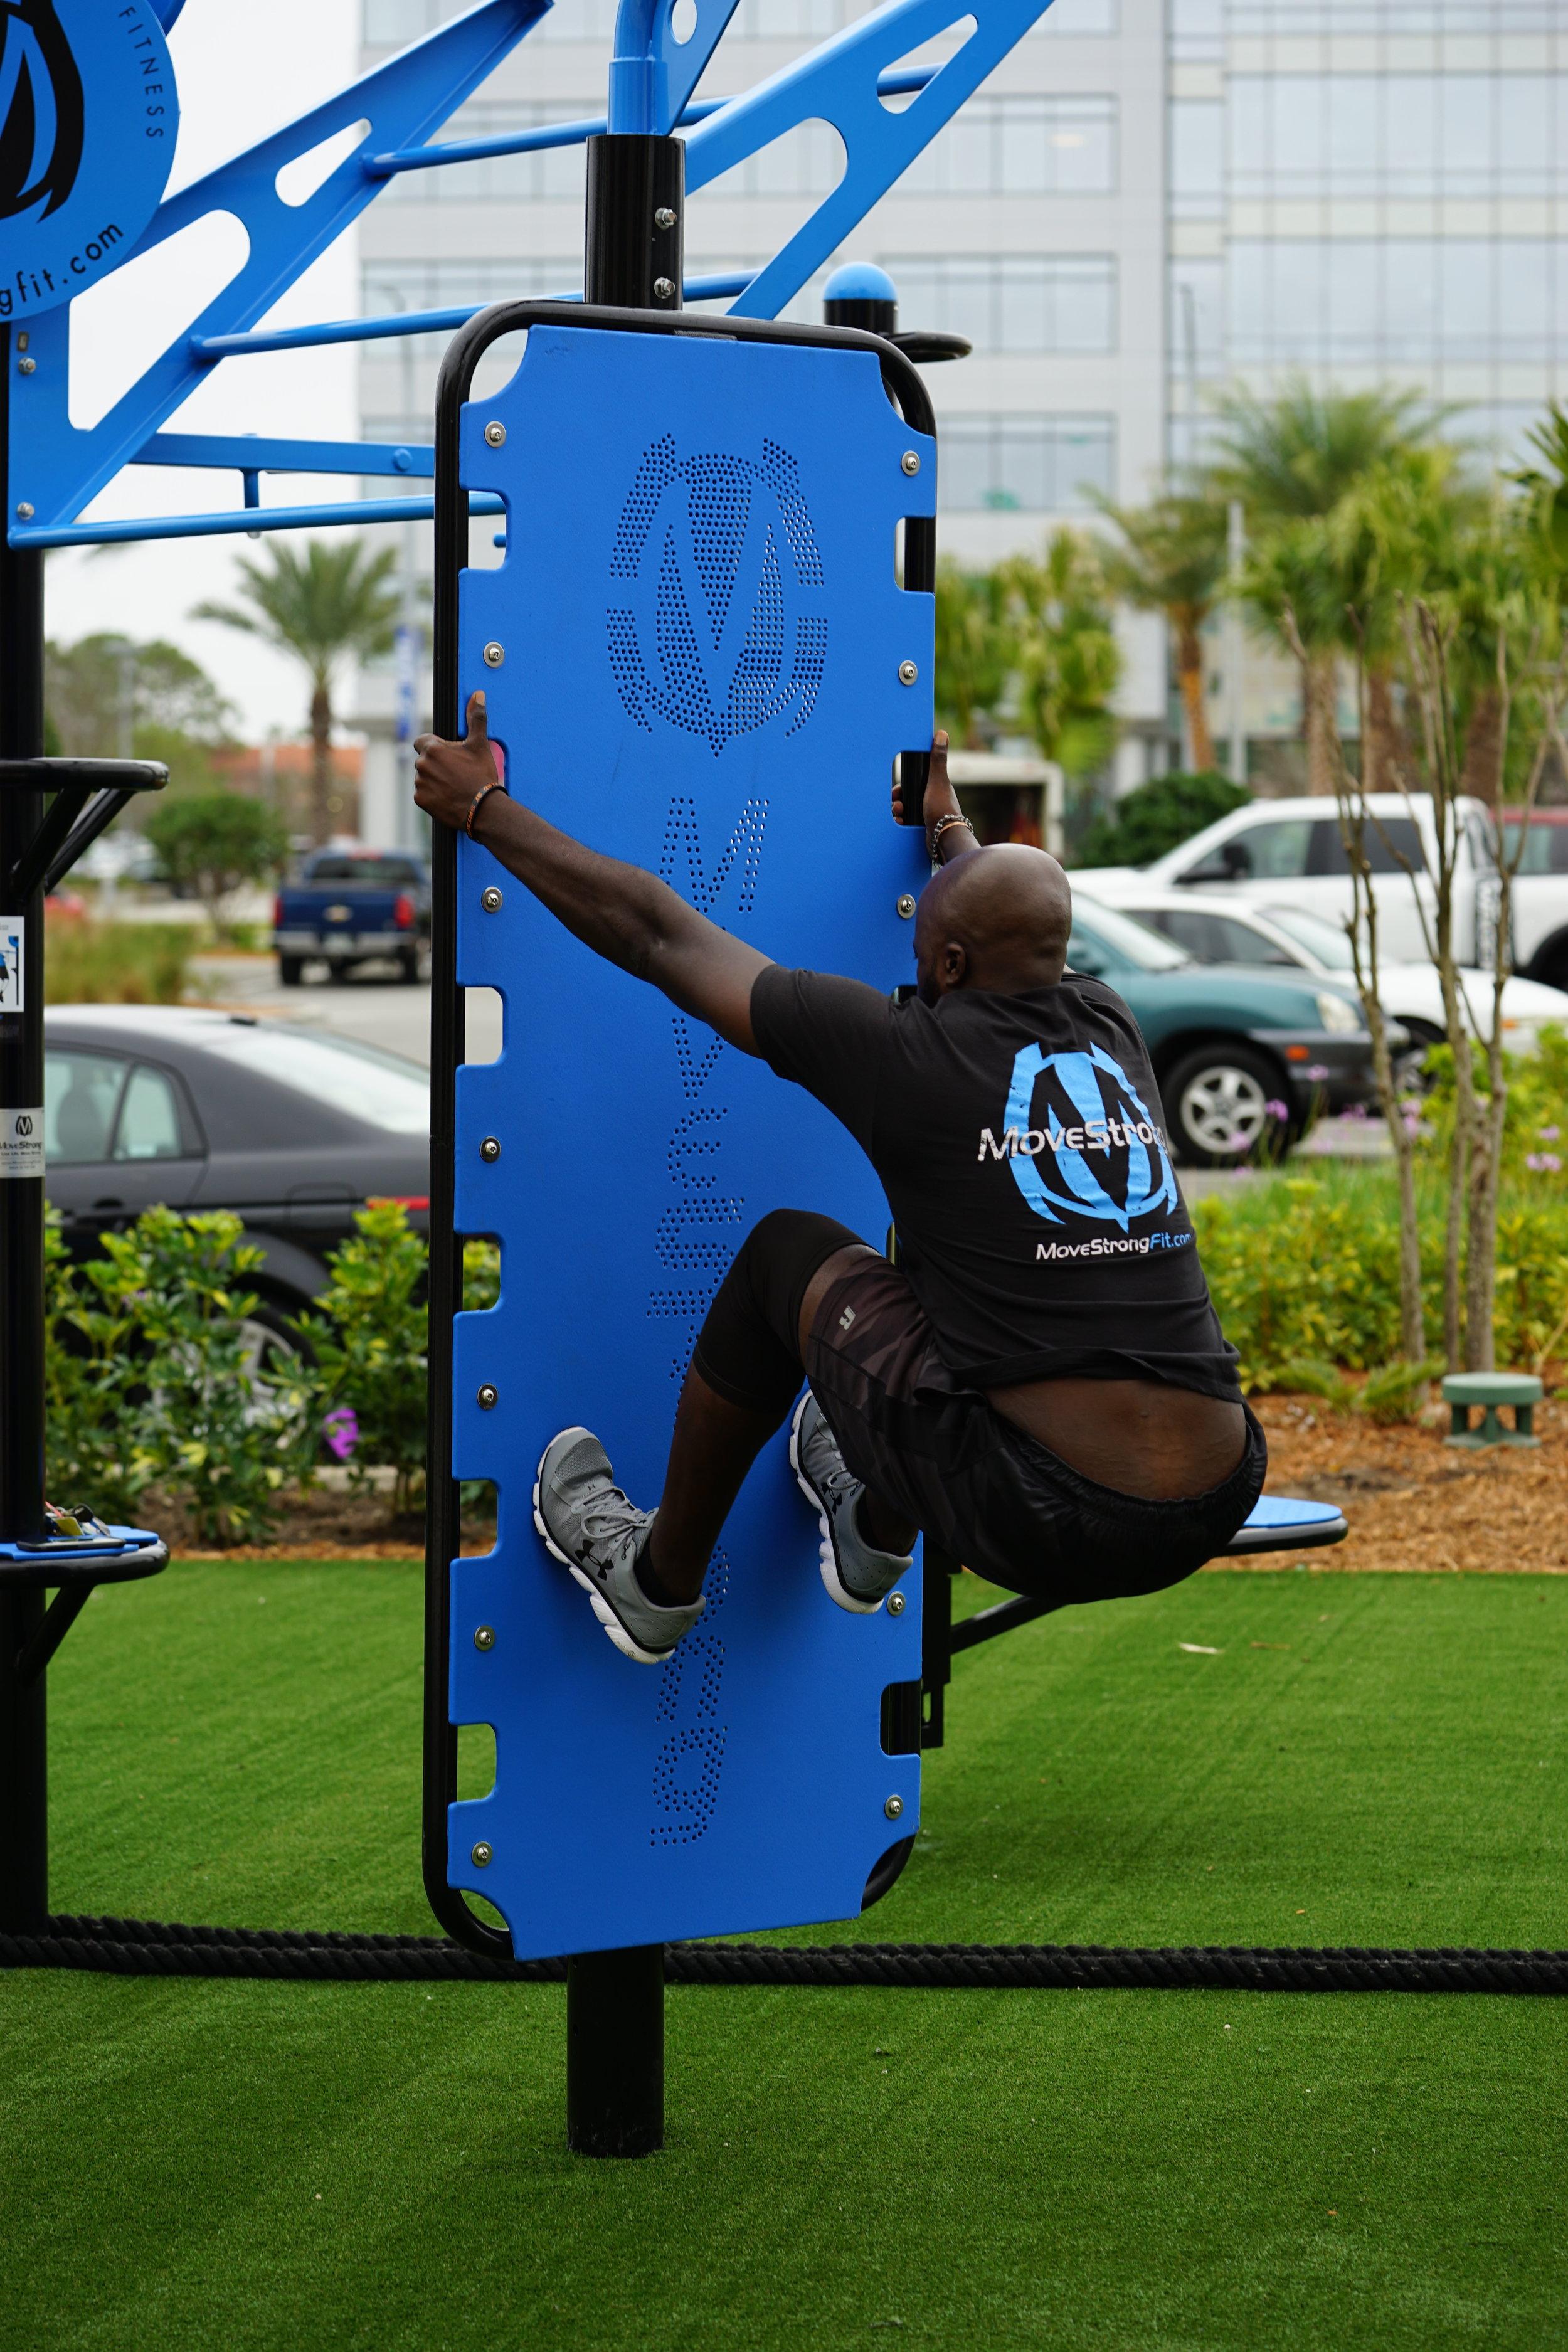 Plyometric outdoor fitness equipment